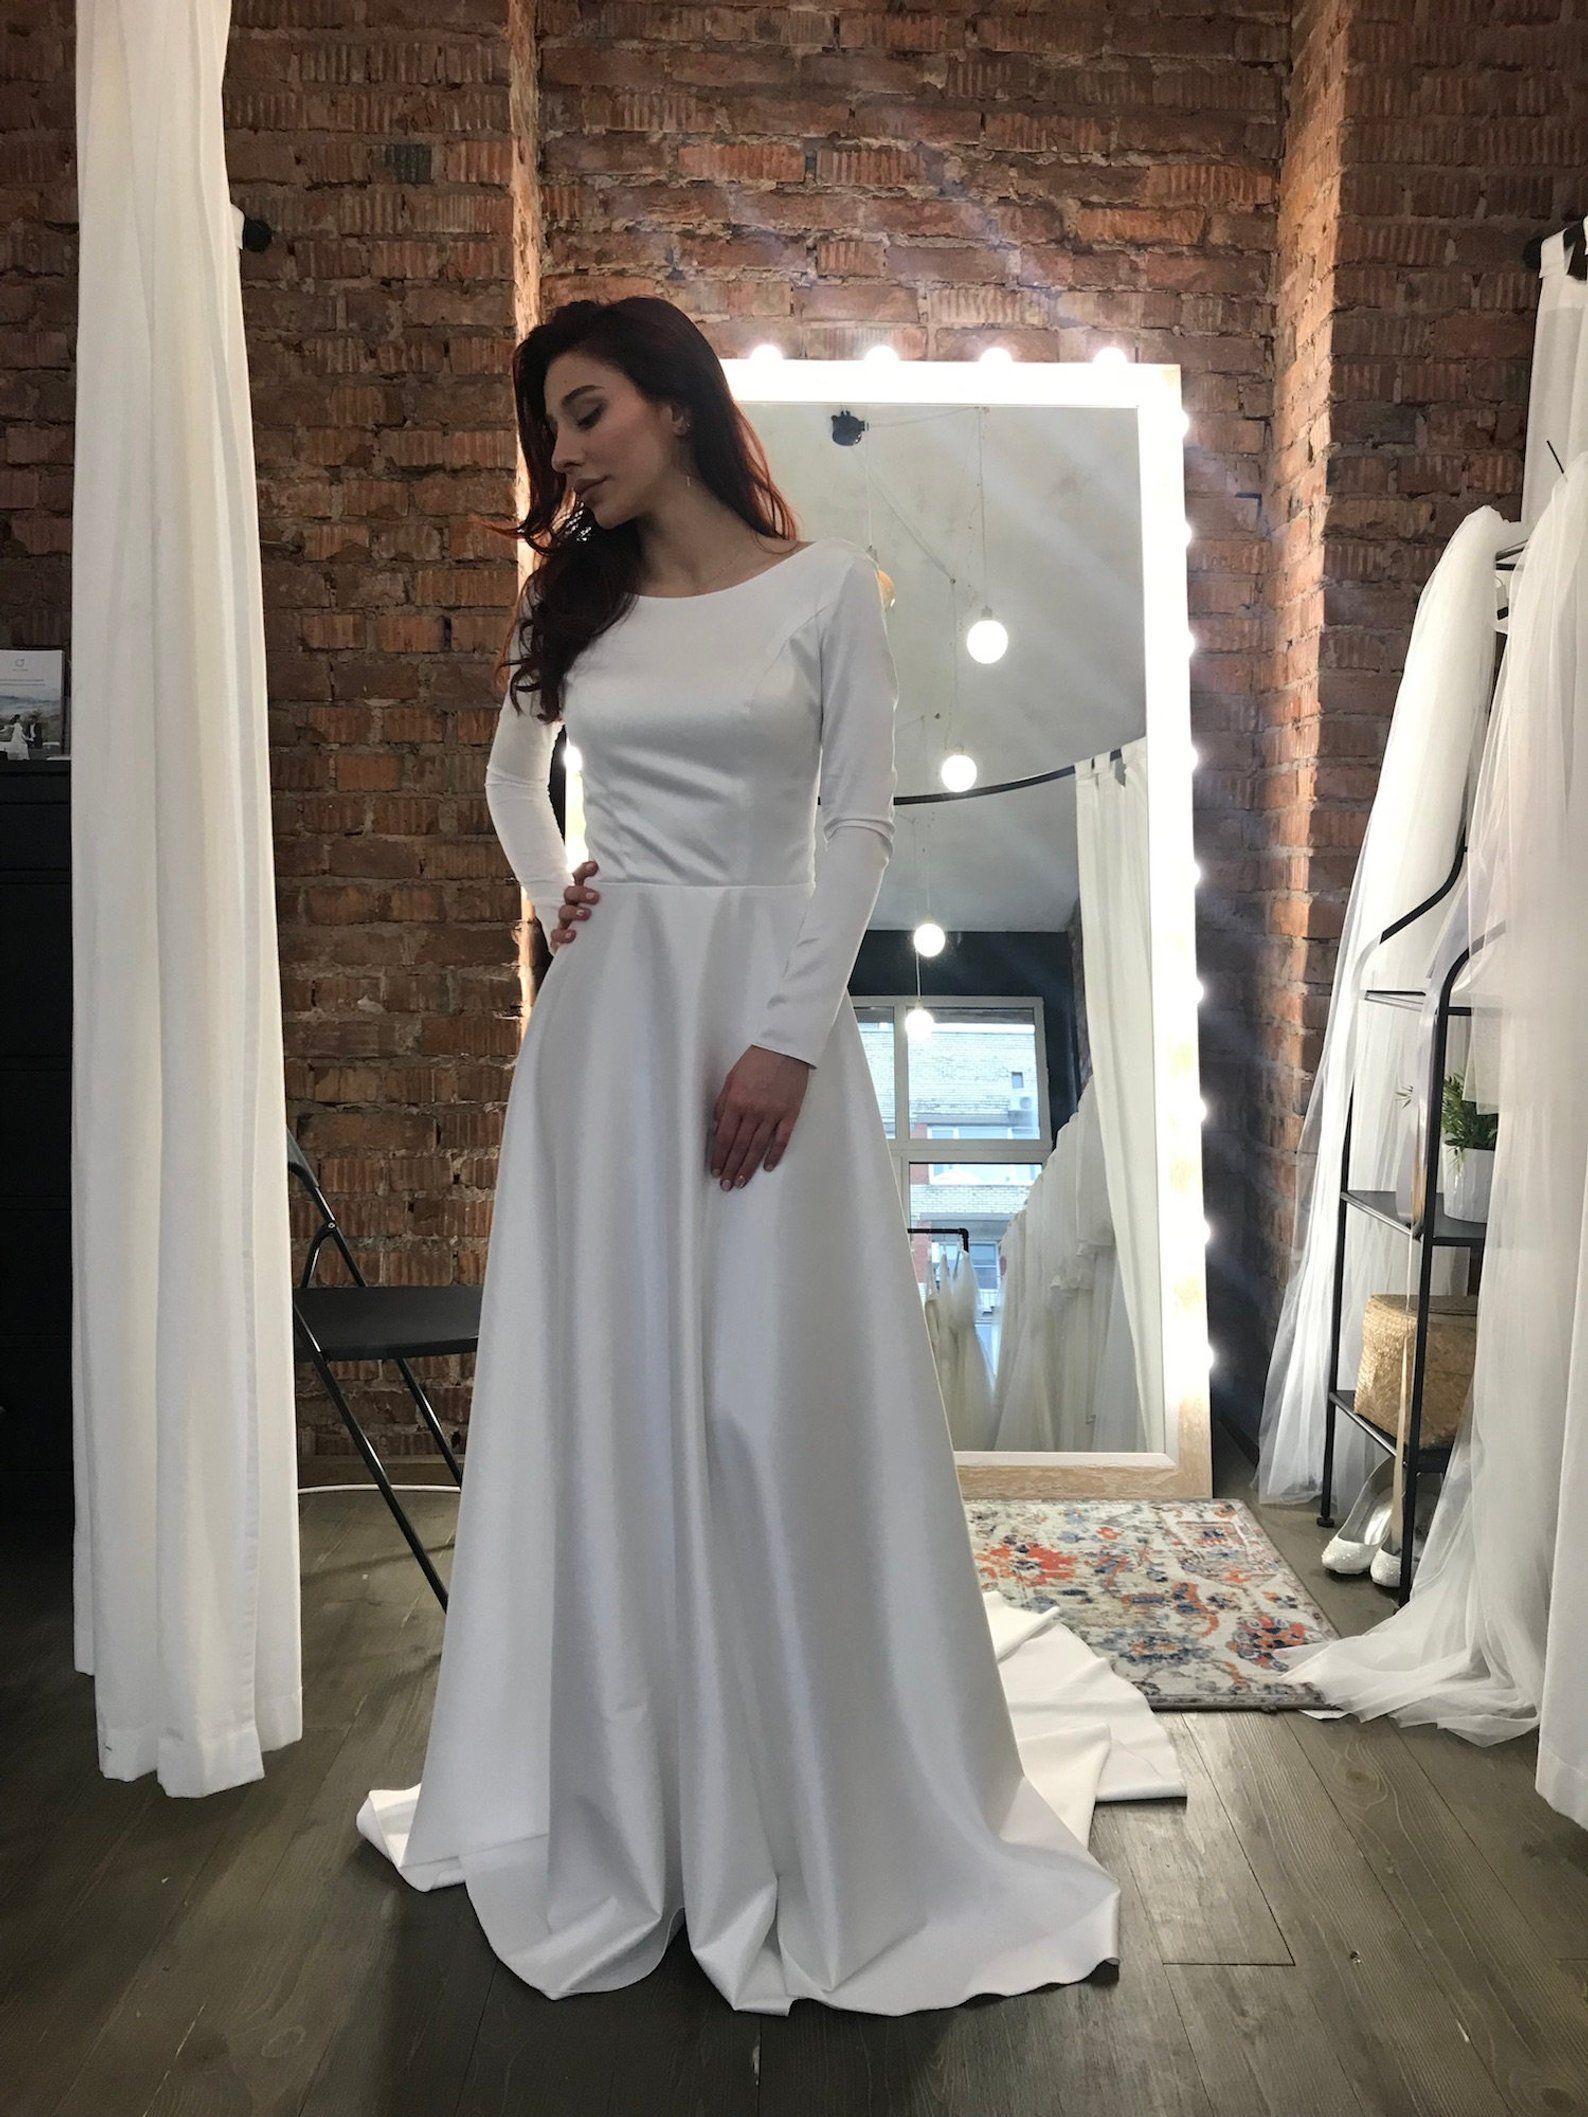 Long Sleeve Wedding Dress Satin Open Back Wedding Dress Etsy Wedding Dress Long Sleeve Wedding Dresses Satin Long Sleeve Wedding Gowns [ 2117 x 1588 Pixel ]